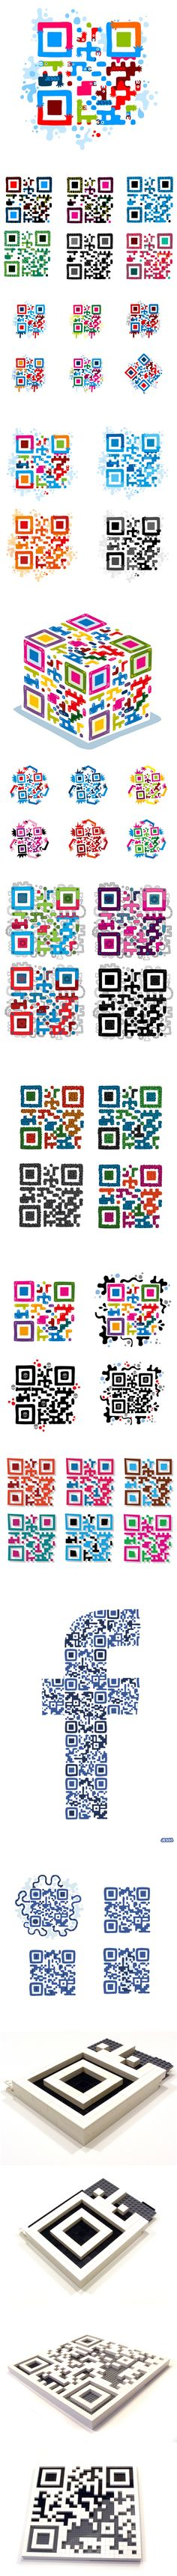 Infographic: QR Code Art by JESS3|Digital Buzz Blog - via http://bit.ly/epinner Facebook Image, Decoding, Mobile Marketing, Online Marketing, Códigos Qr, Code Art, Ui Elements, Qr Codes, App Icon